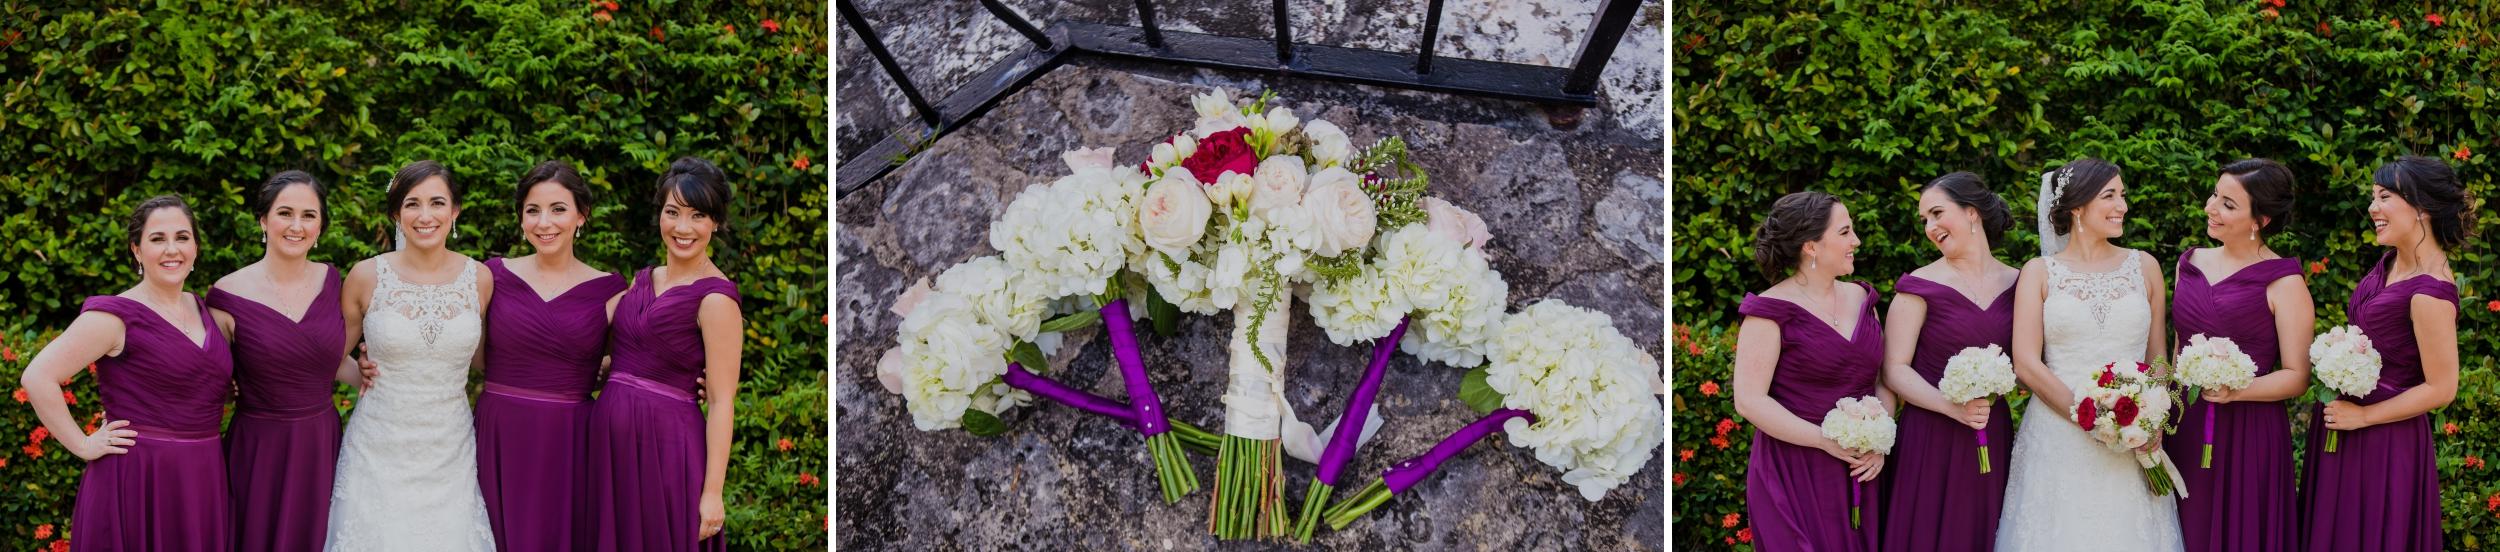 Wedding Hotel Colonnade Coral Gables - Santy Martinez 20.jpg